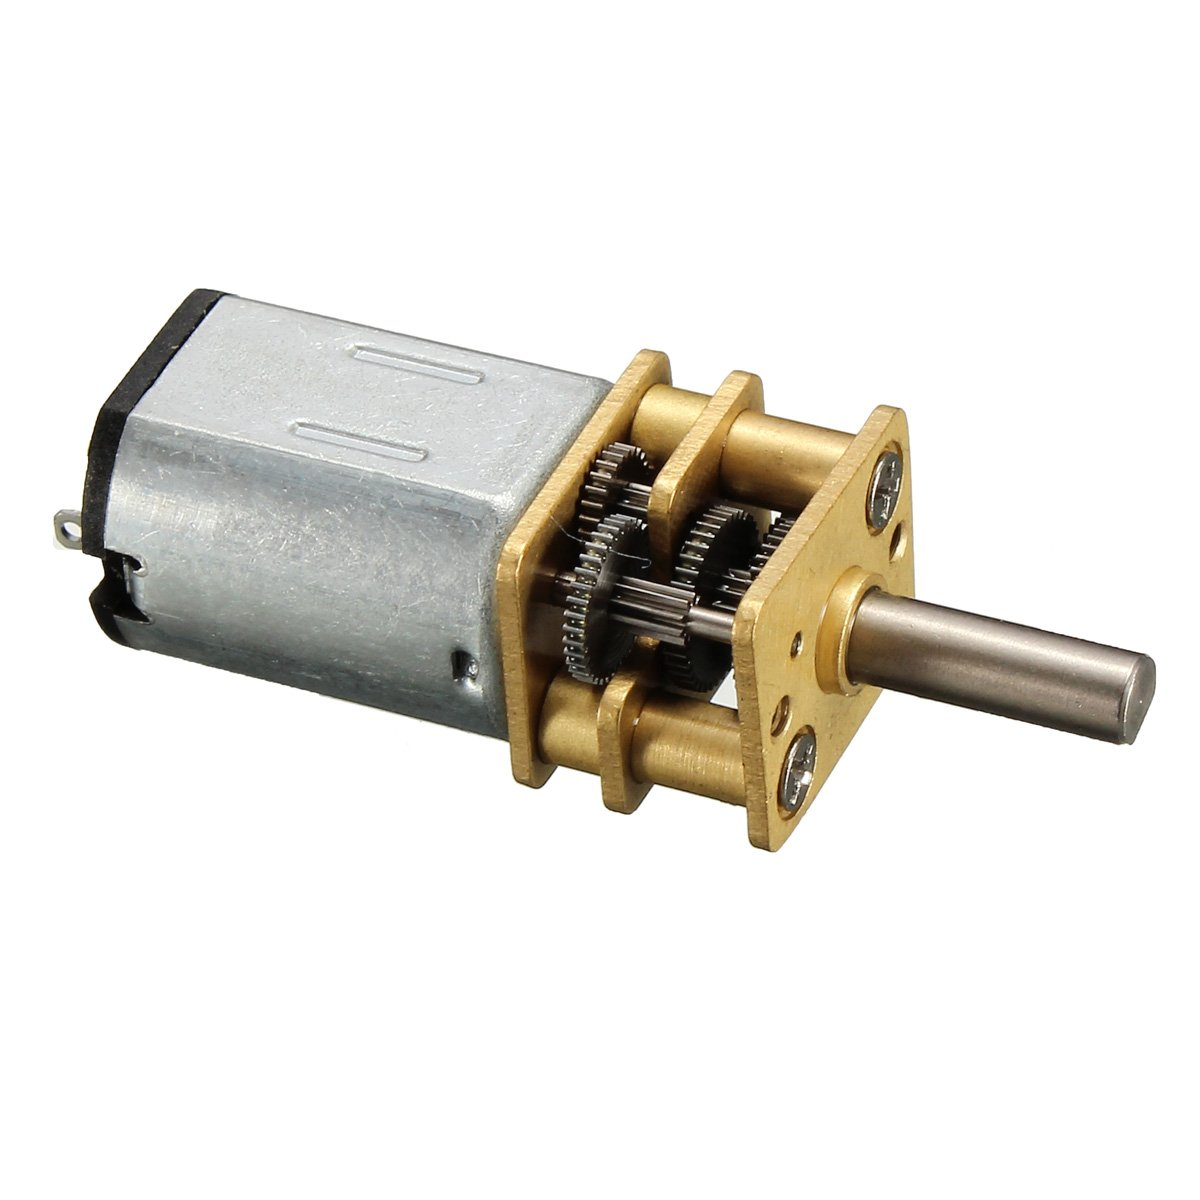 N20-3V-200 RPM Micro Metal Gear-box DC Motor